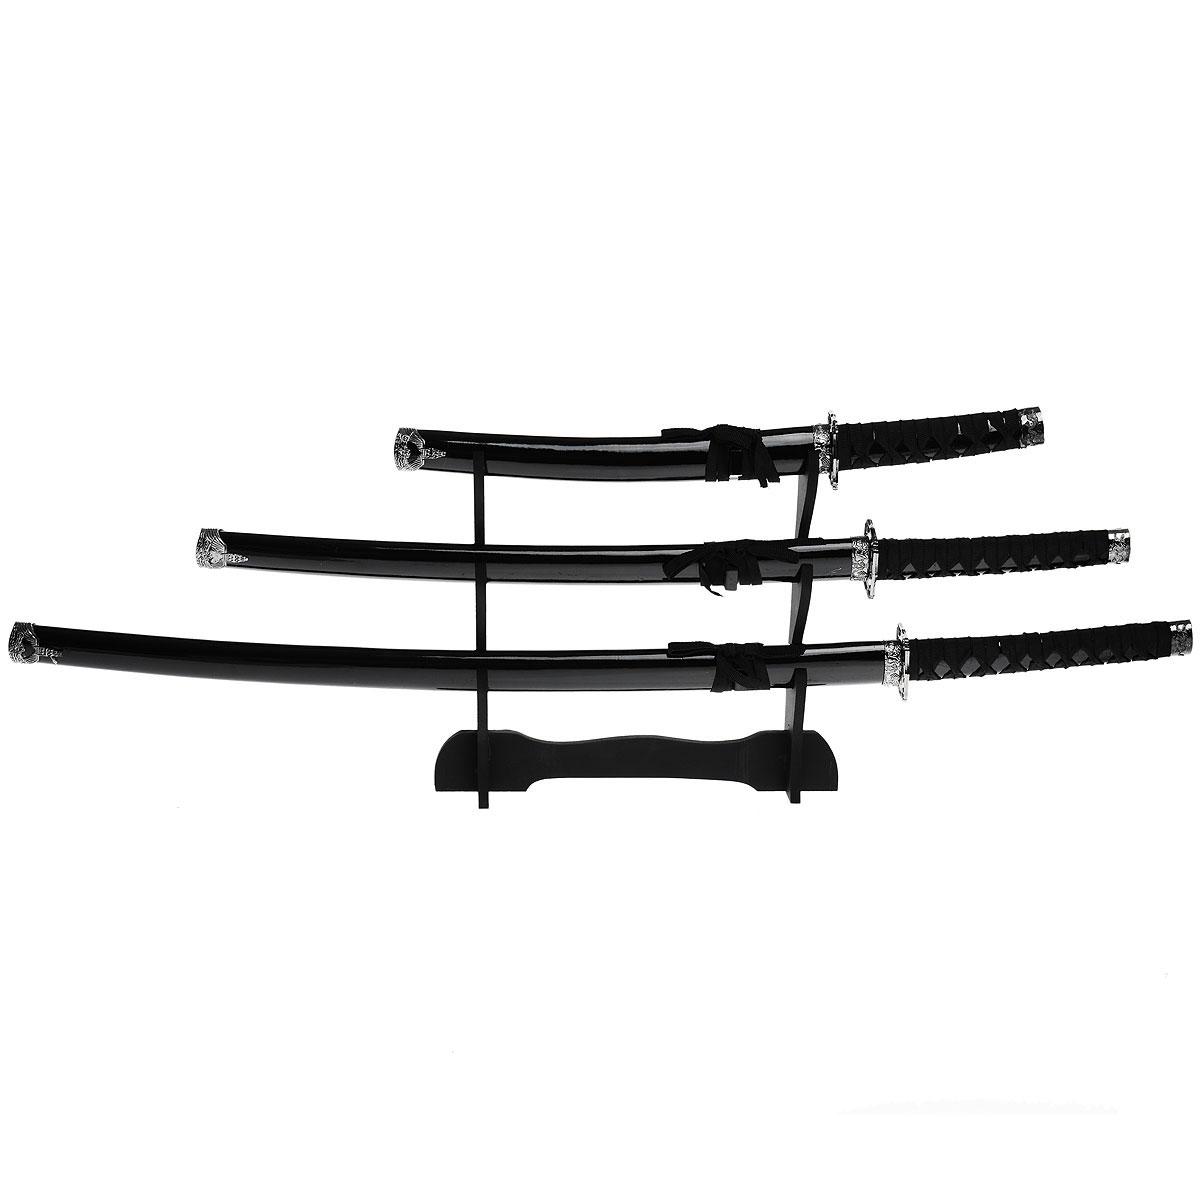 Набор самурайских мечей на подставке, 3 шт. 454263